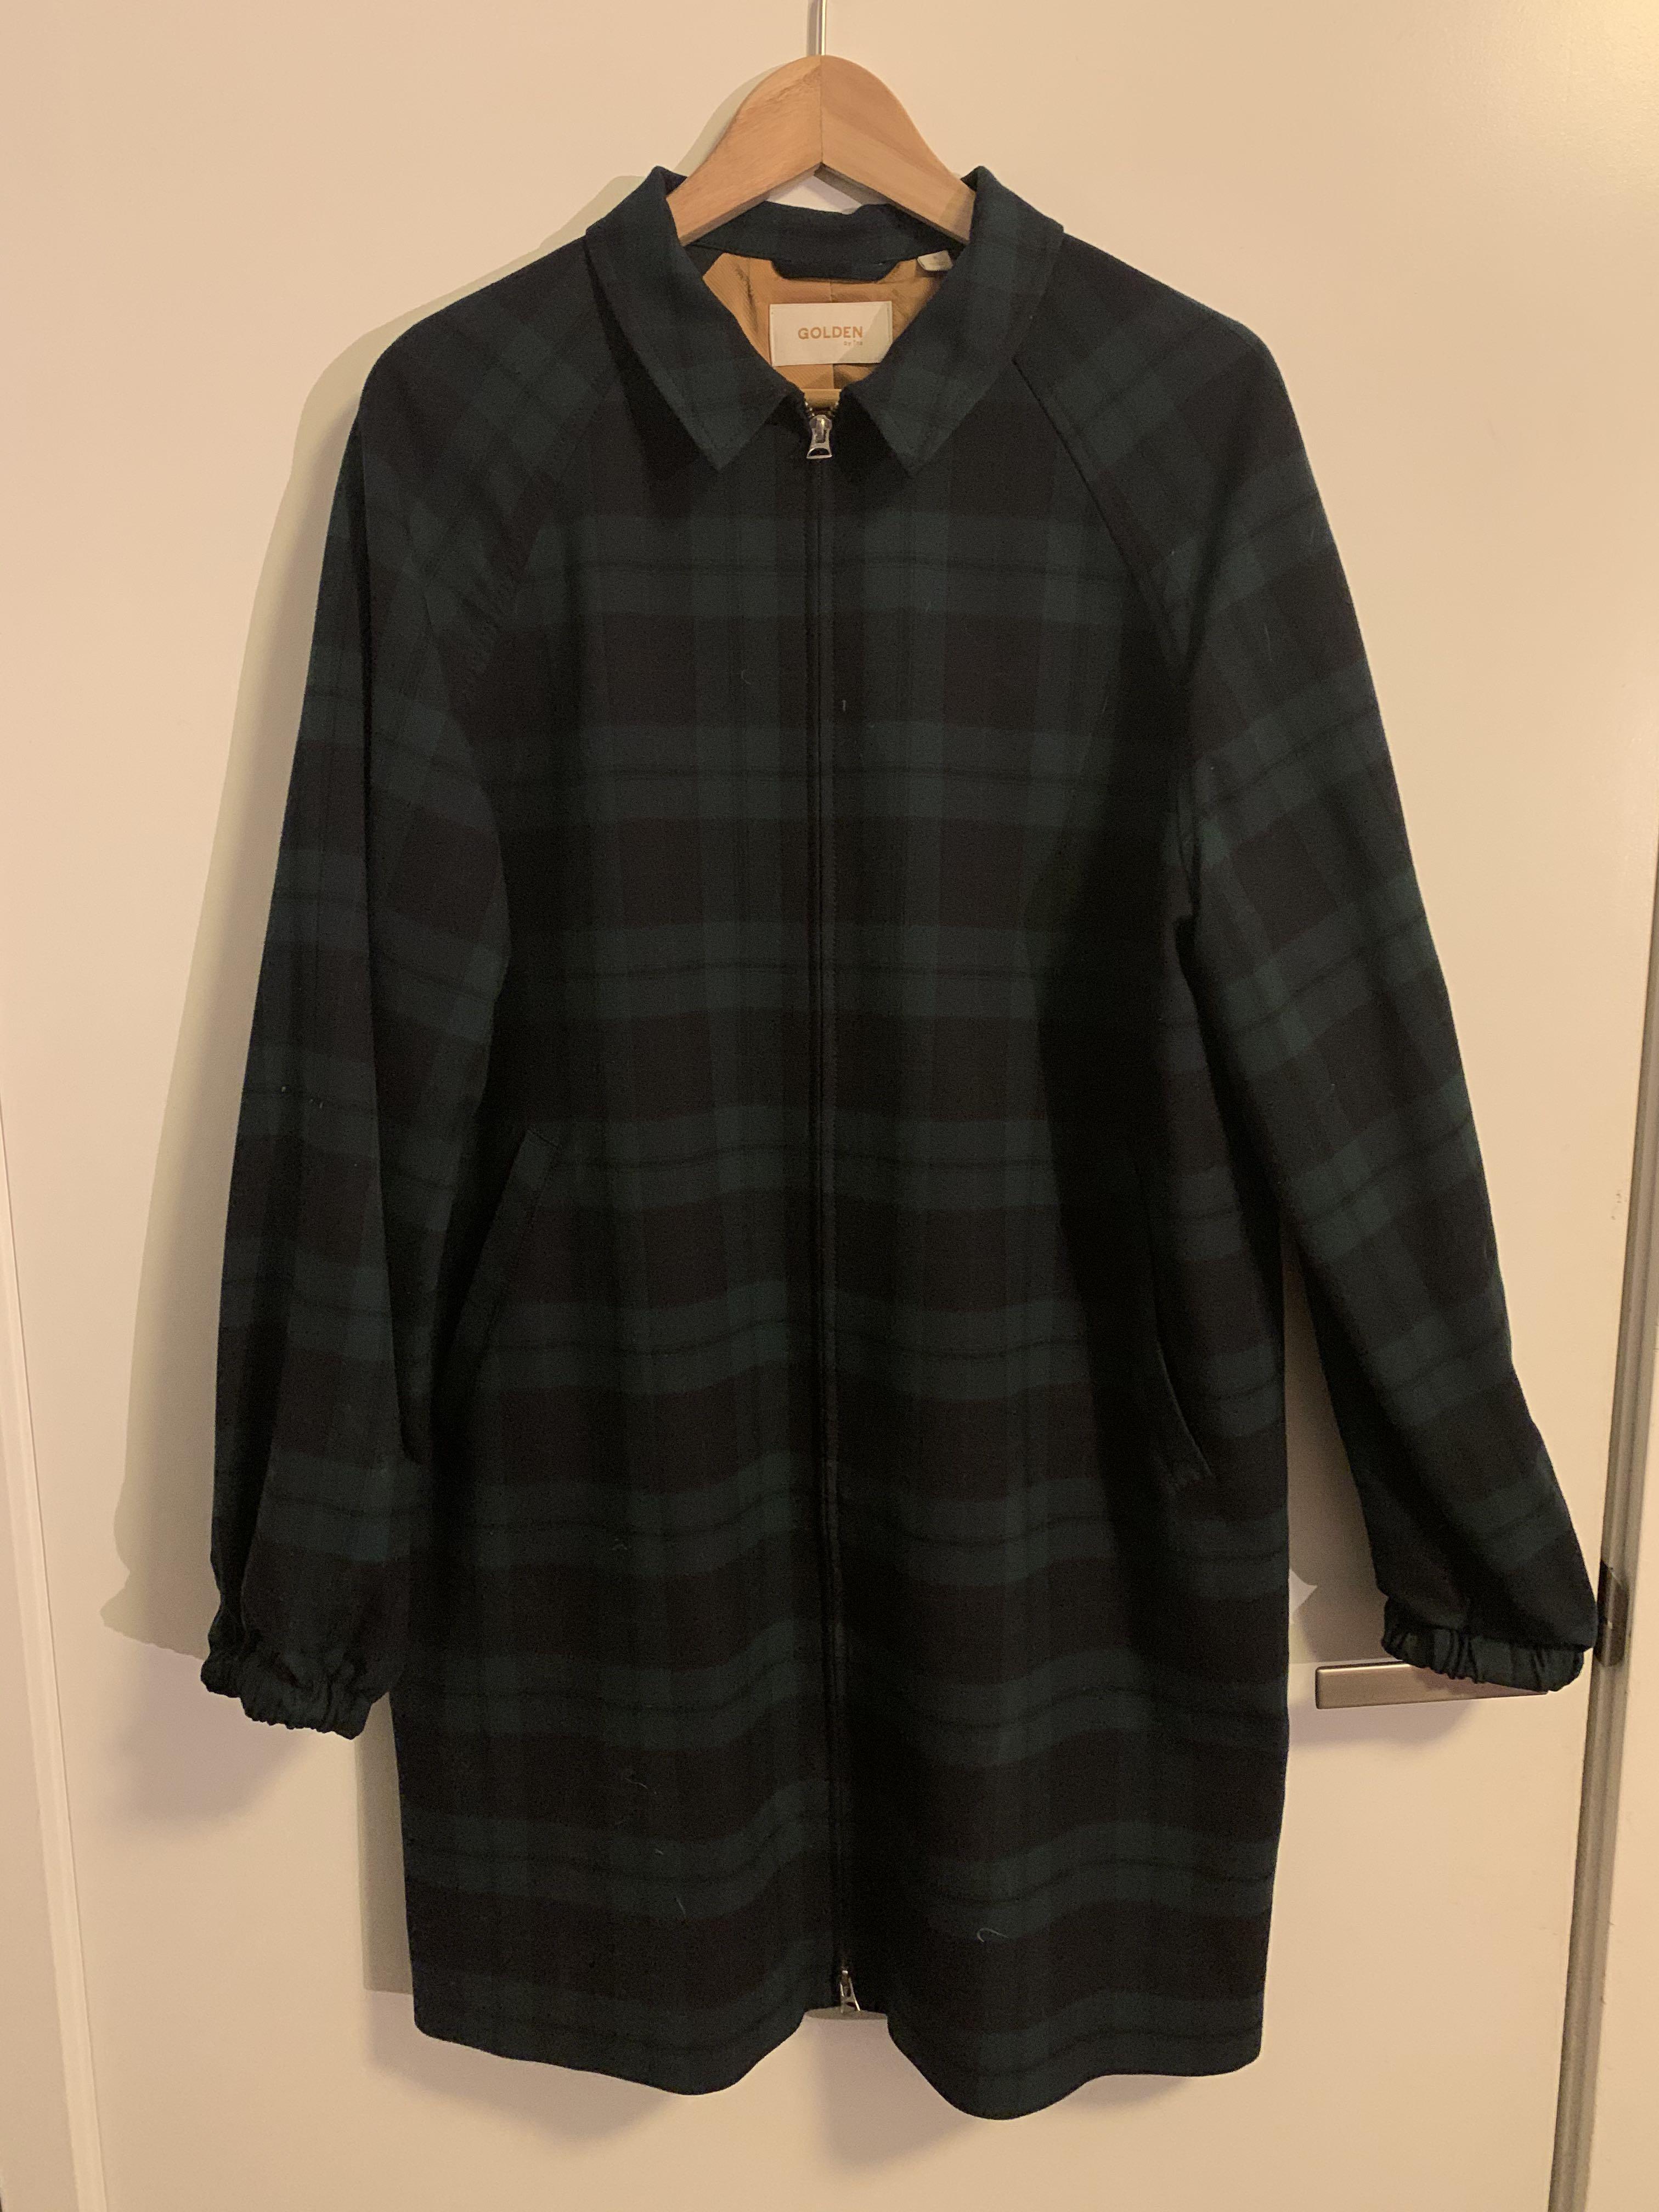 Aritzia plaid jacket